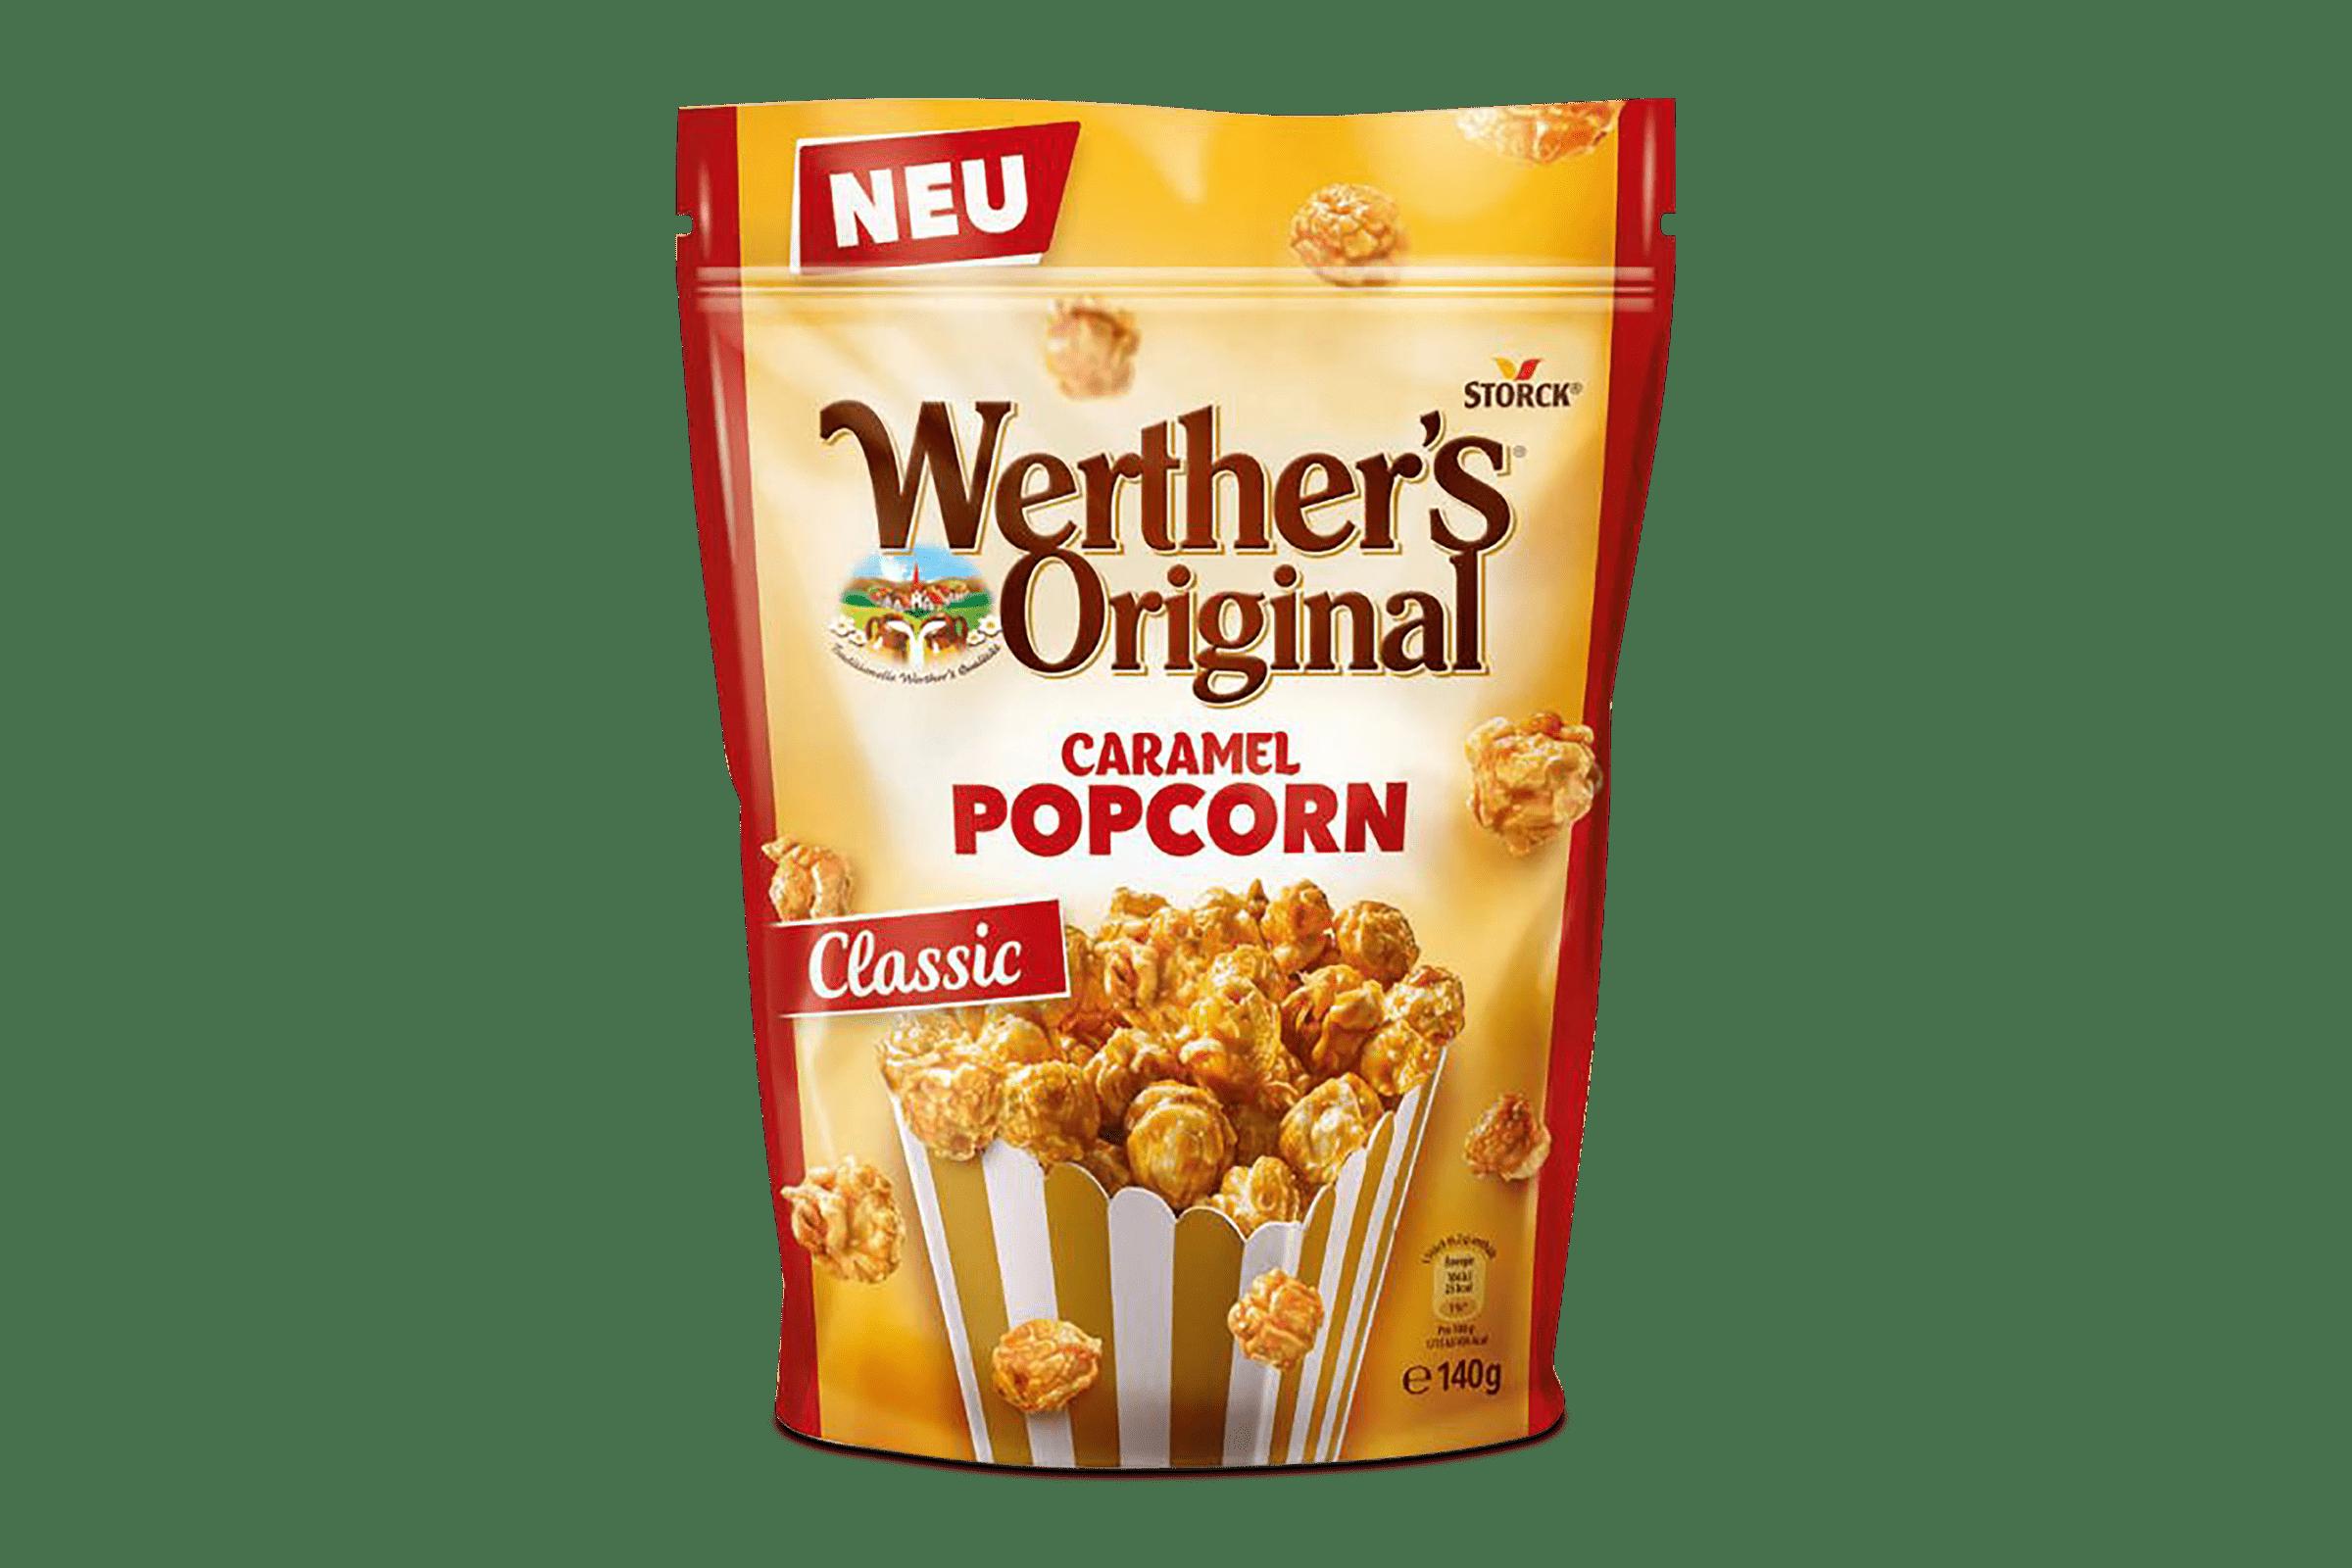 Popcorn Caramel Werthers 1